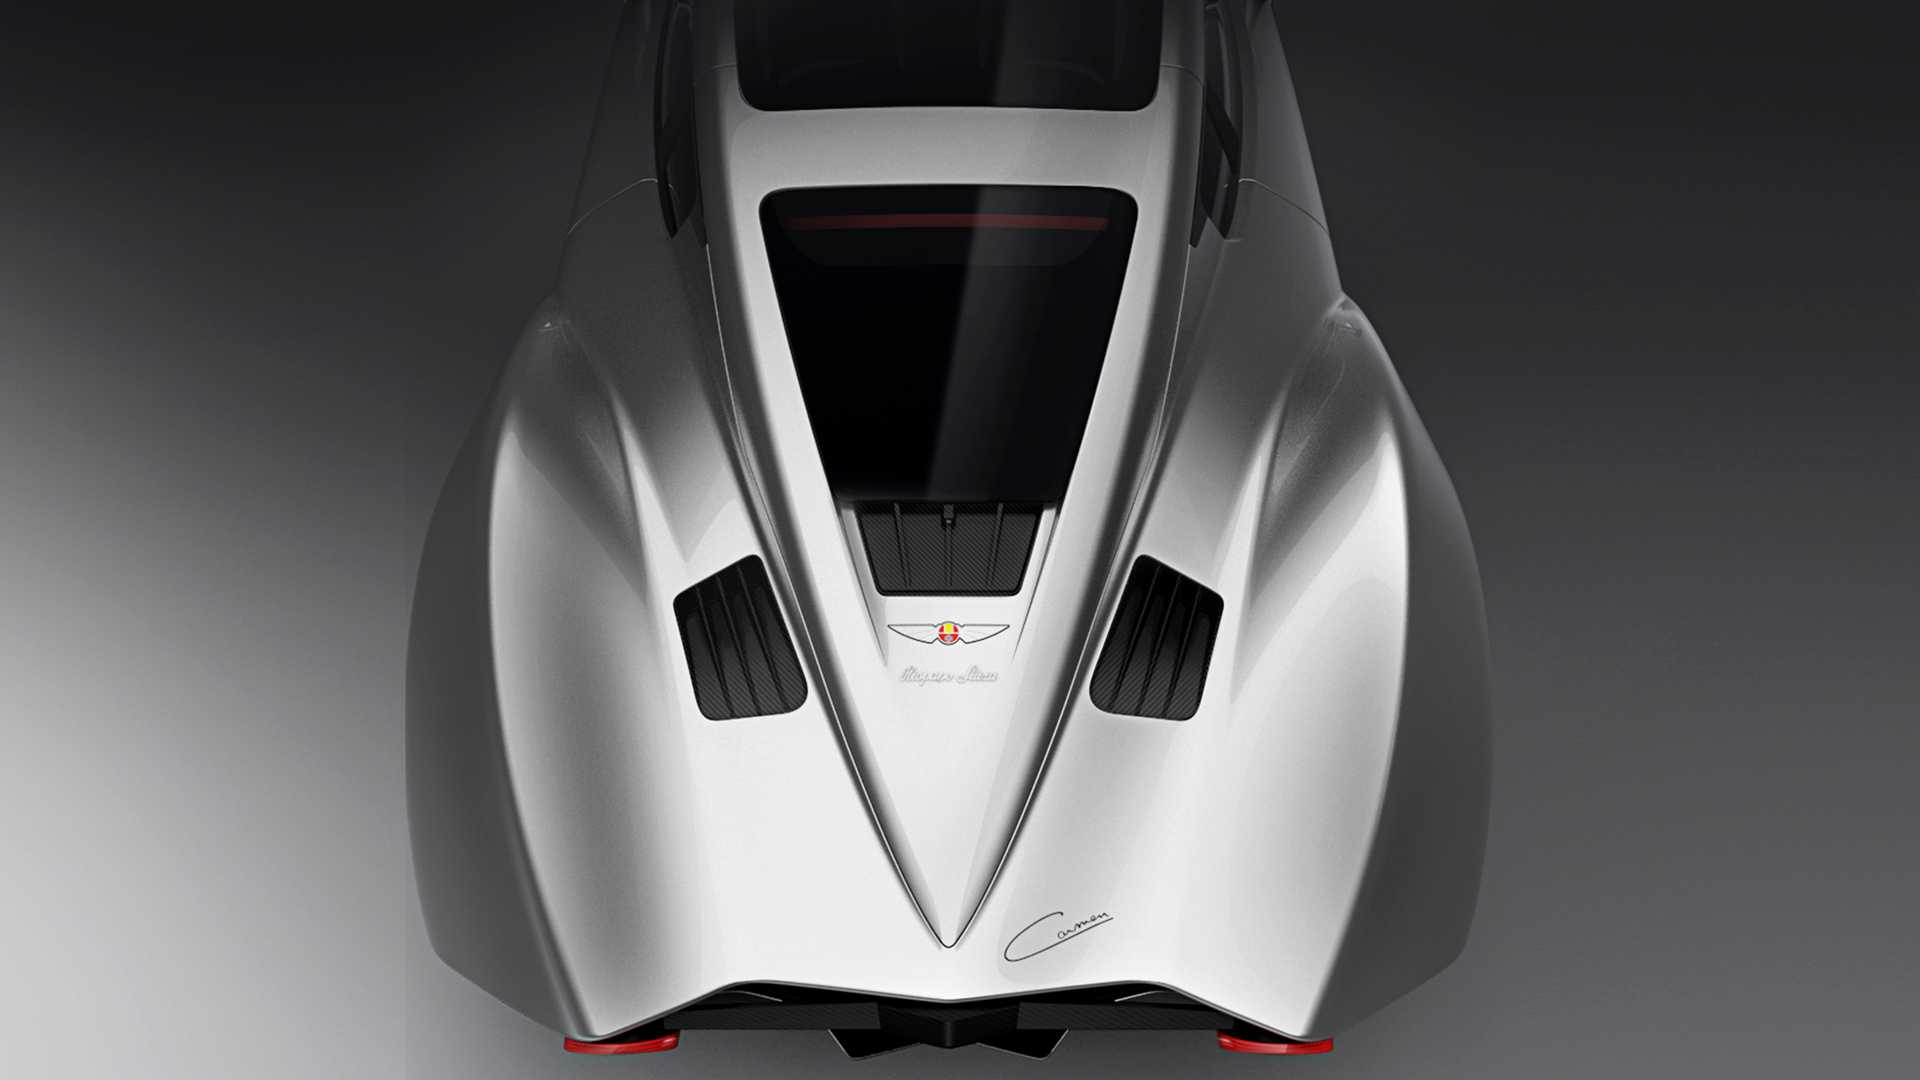 2x Chrome OEM Corvette Stingray Mako Shark Fender Emblem C7 Silverado Gm RTH  FU